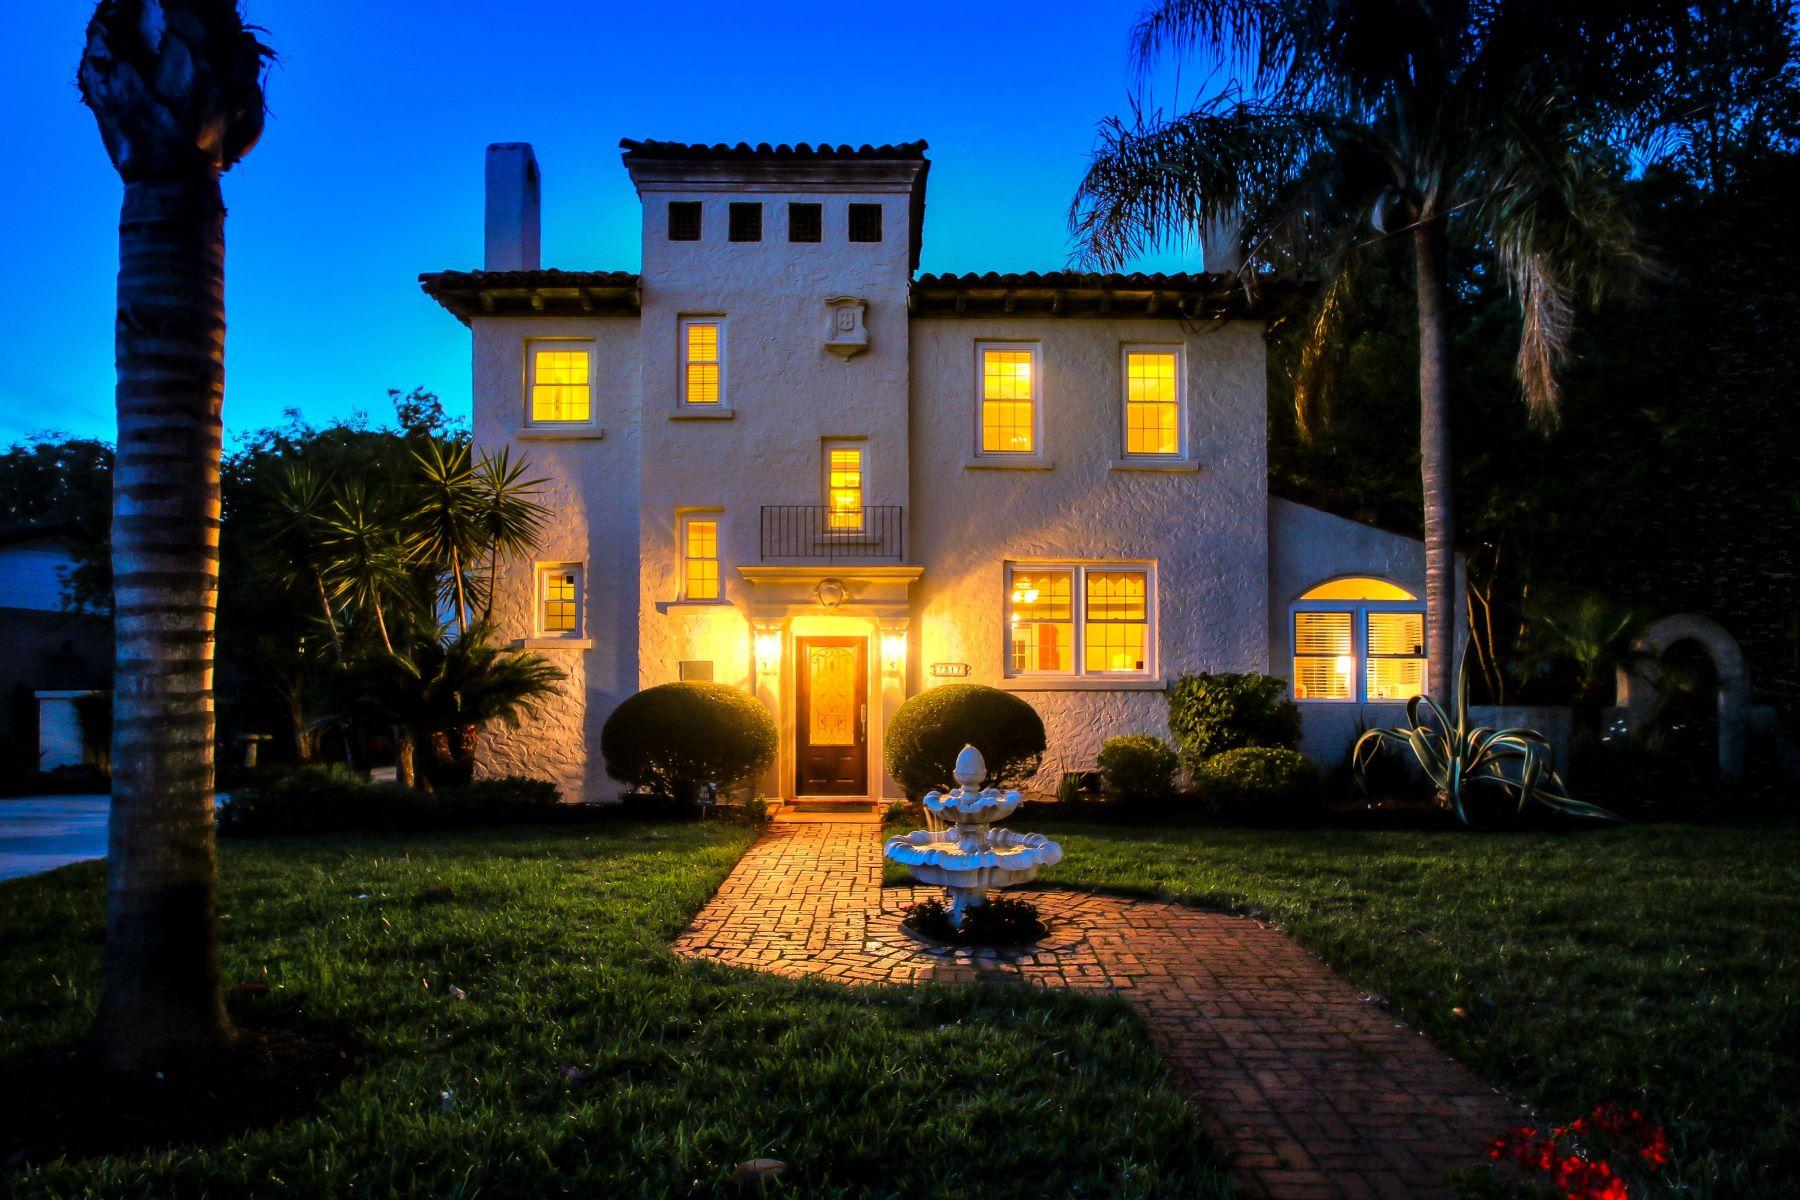 Single Family Home for Sale at 7317 San Jose 7317 San Jose Blvd Jacksonville, Florida, 32217 United States